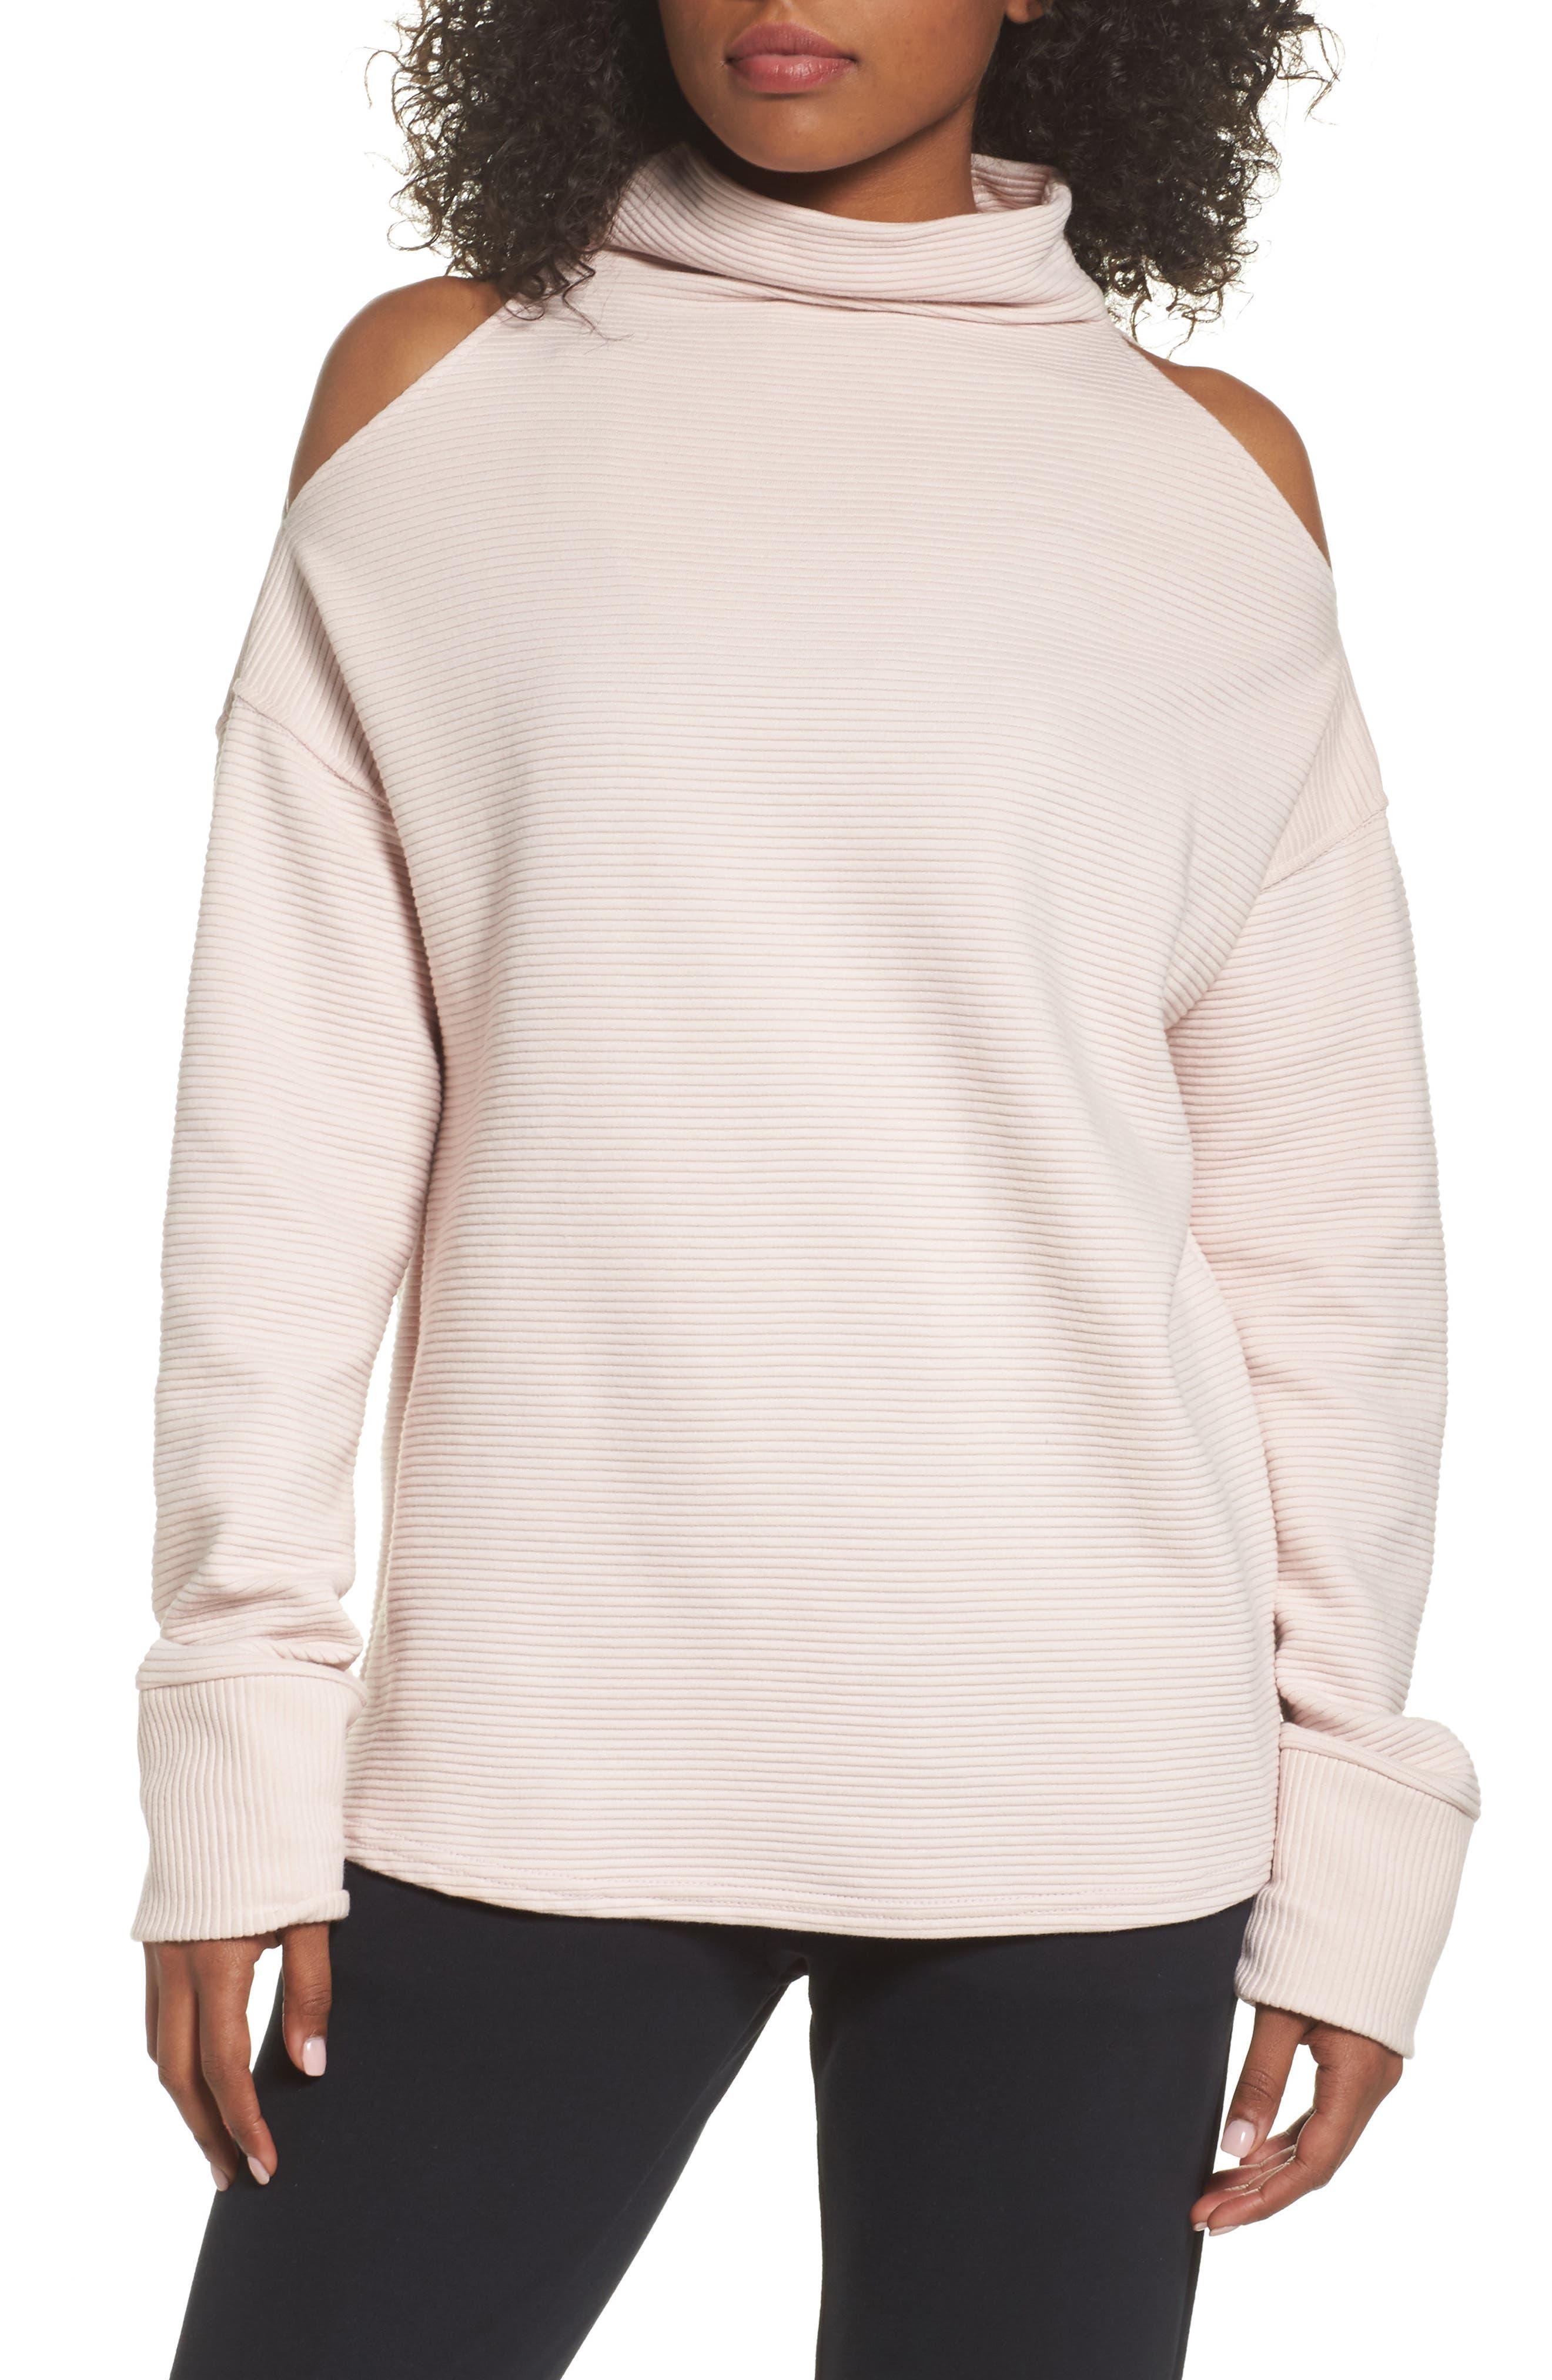 Varley Hampton Cold Shoulder Sweatshirt